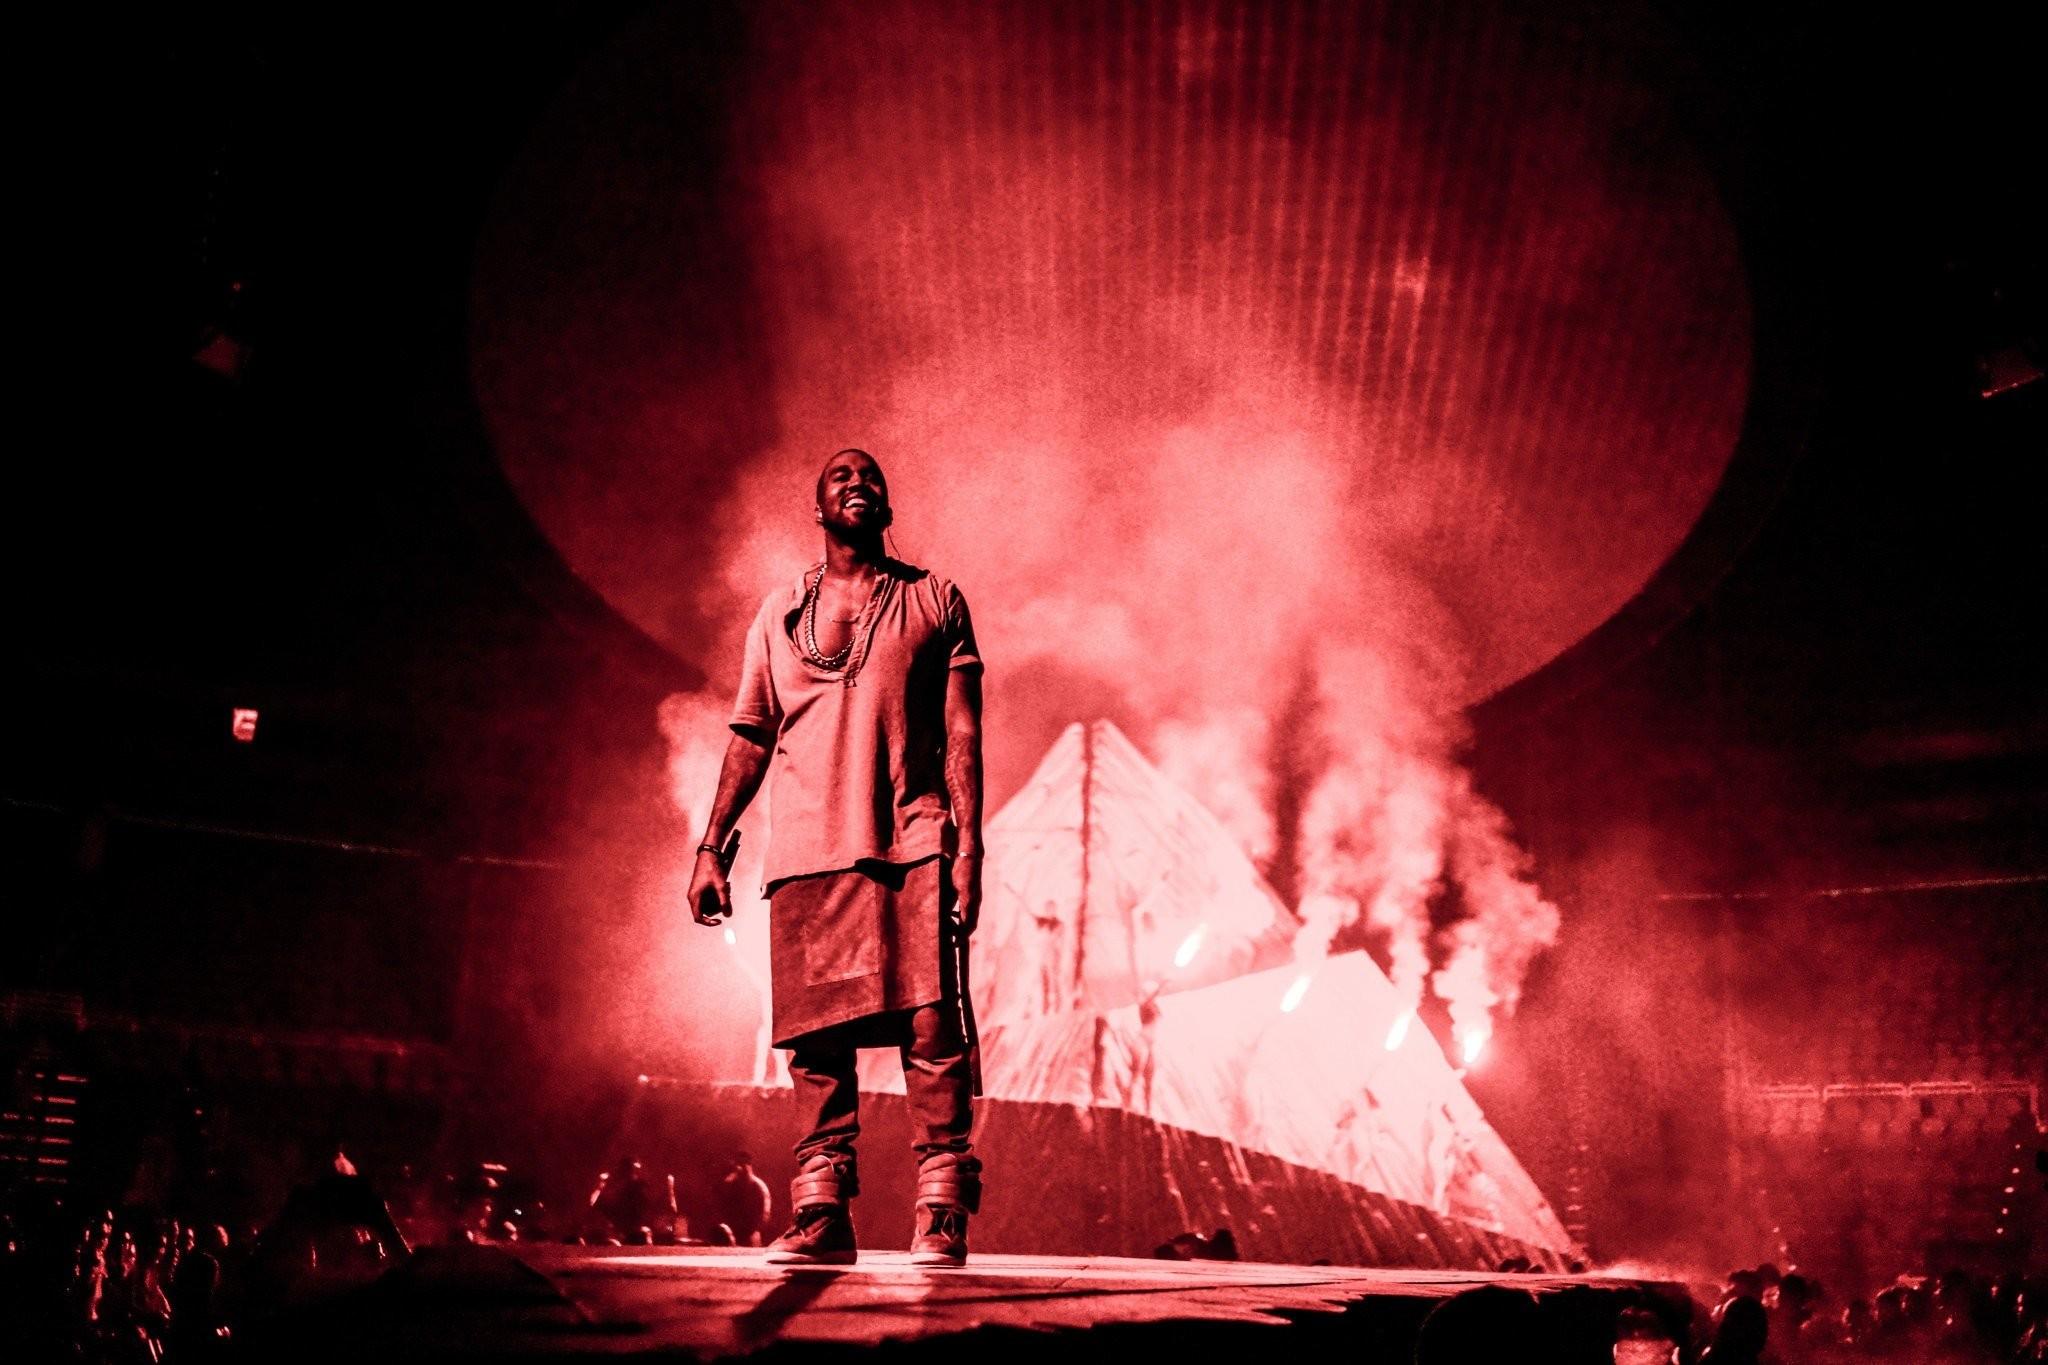 Yeezus Kanye West 121095